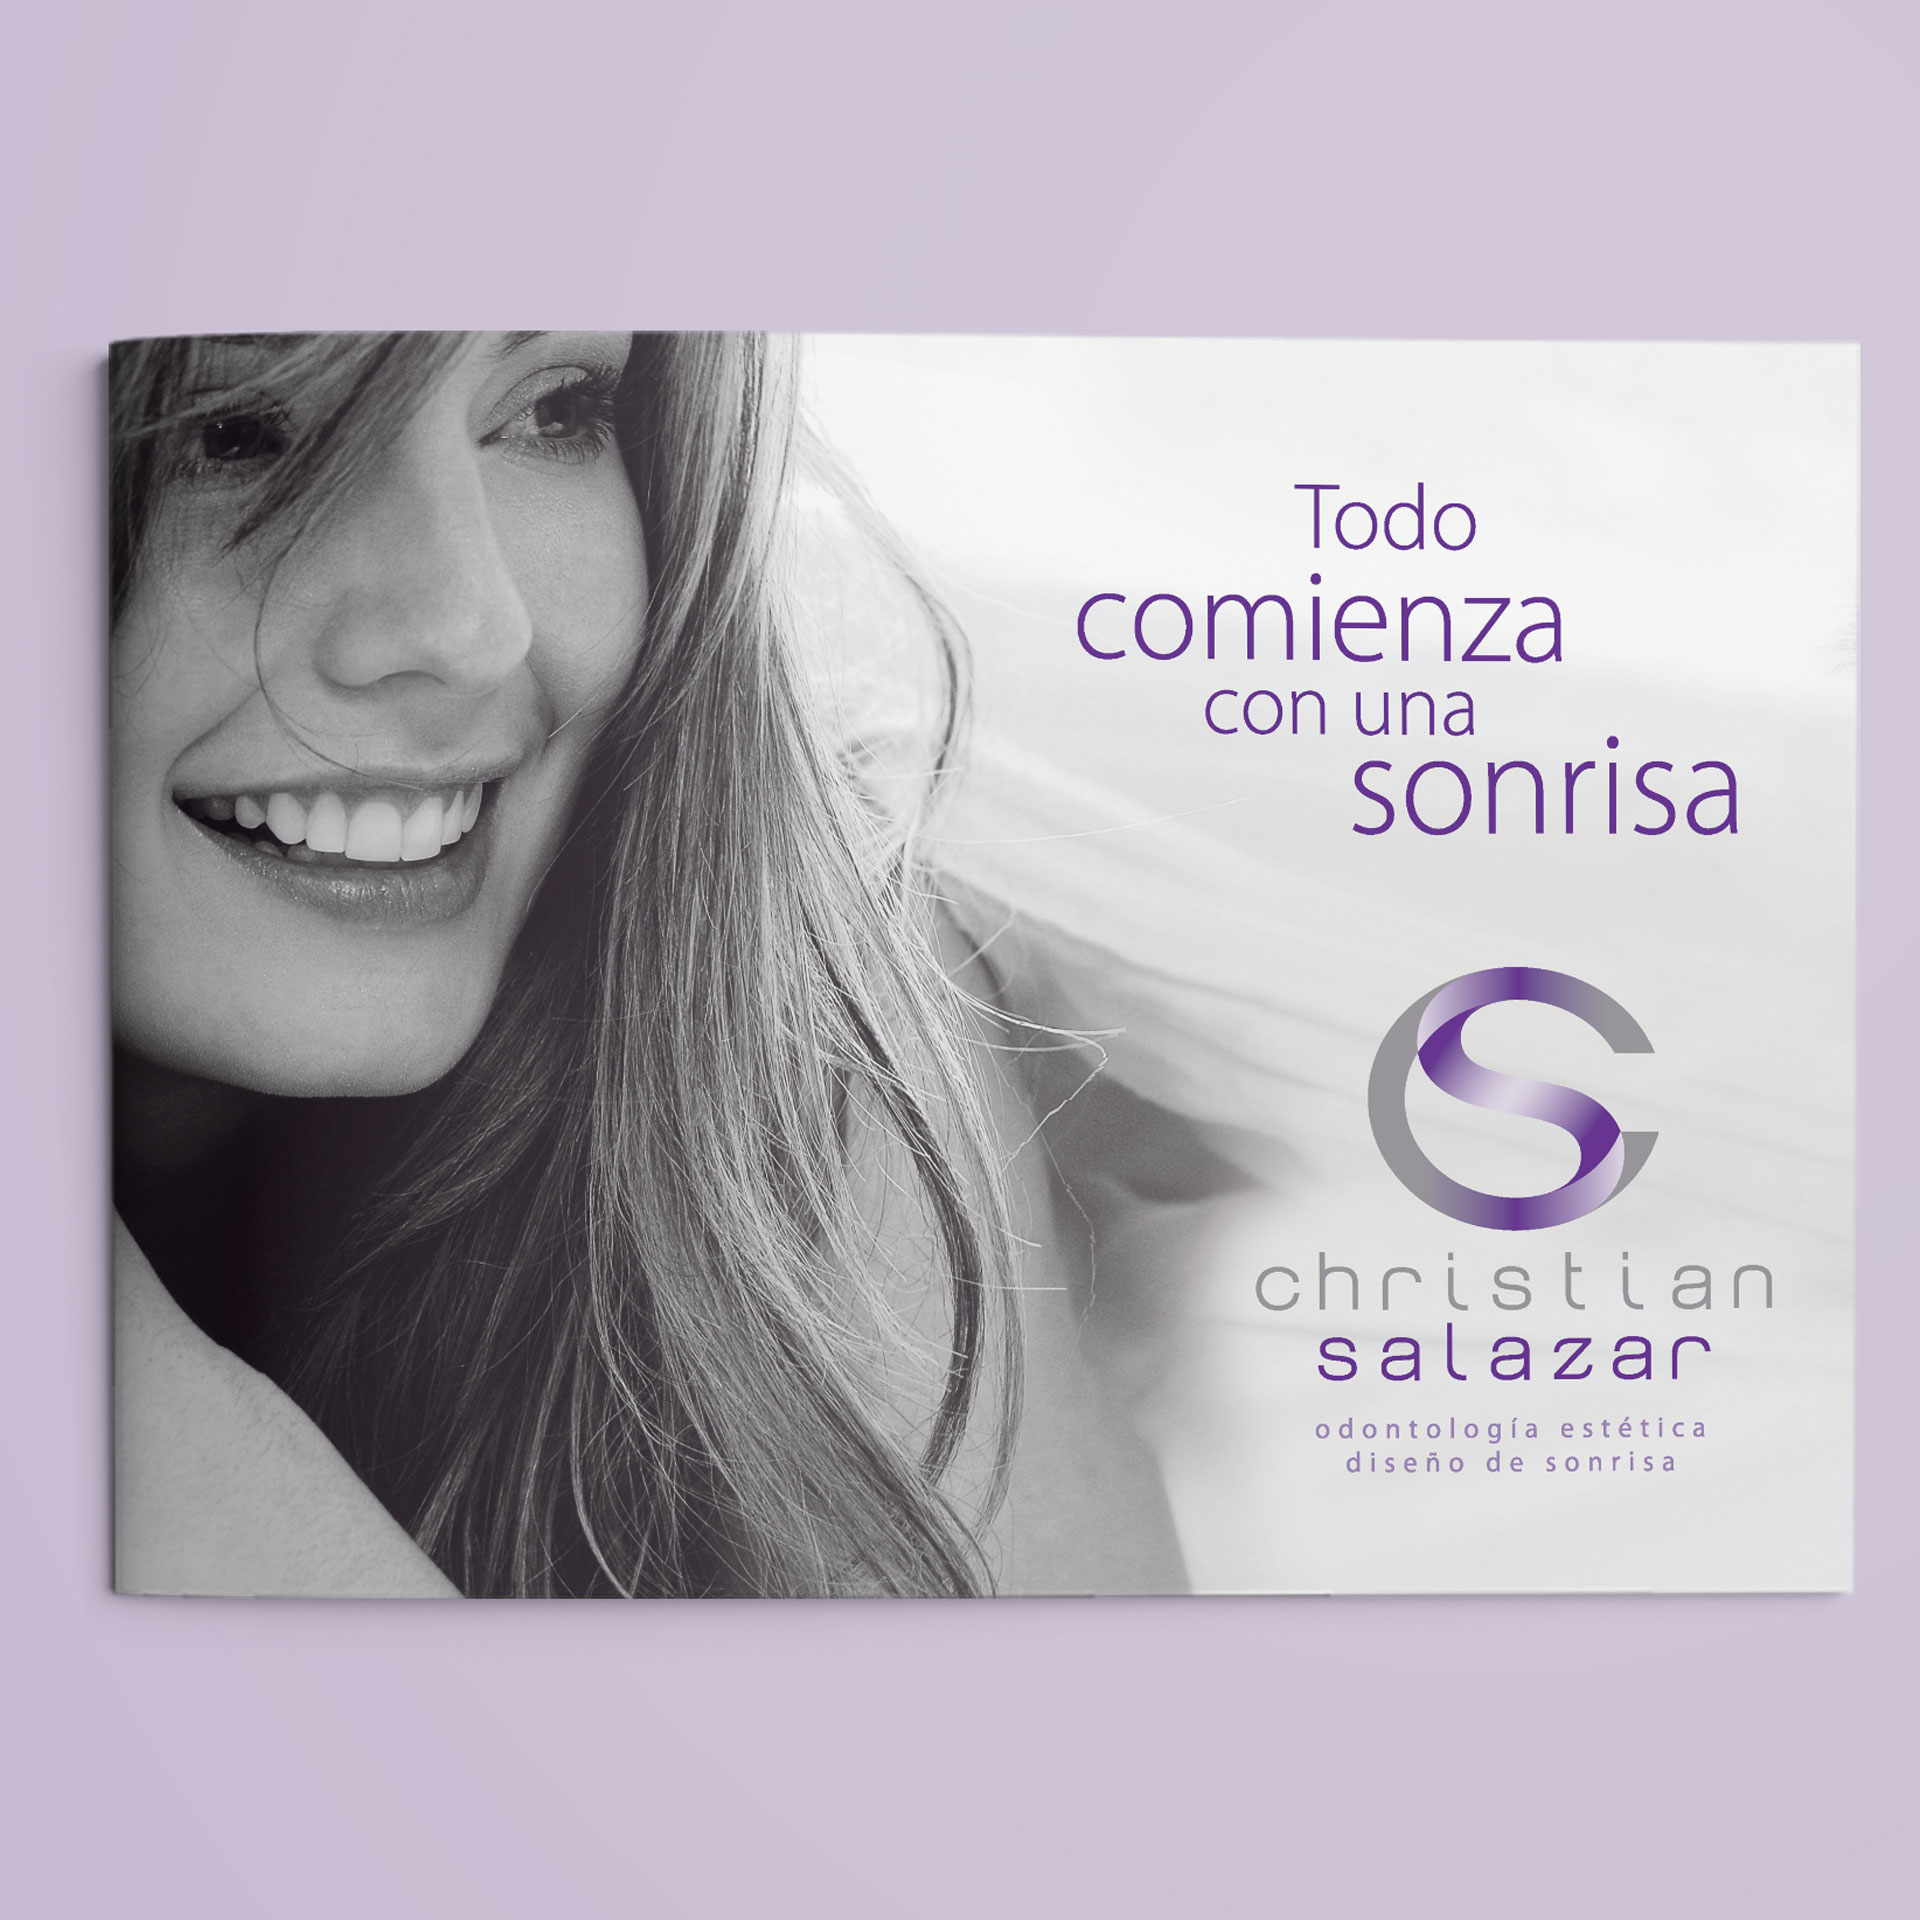 Brochure Christian Salazar Odontología Estética